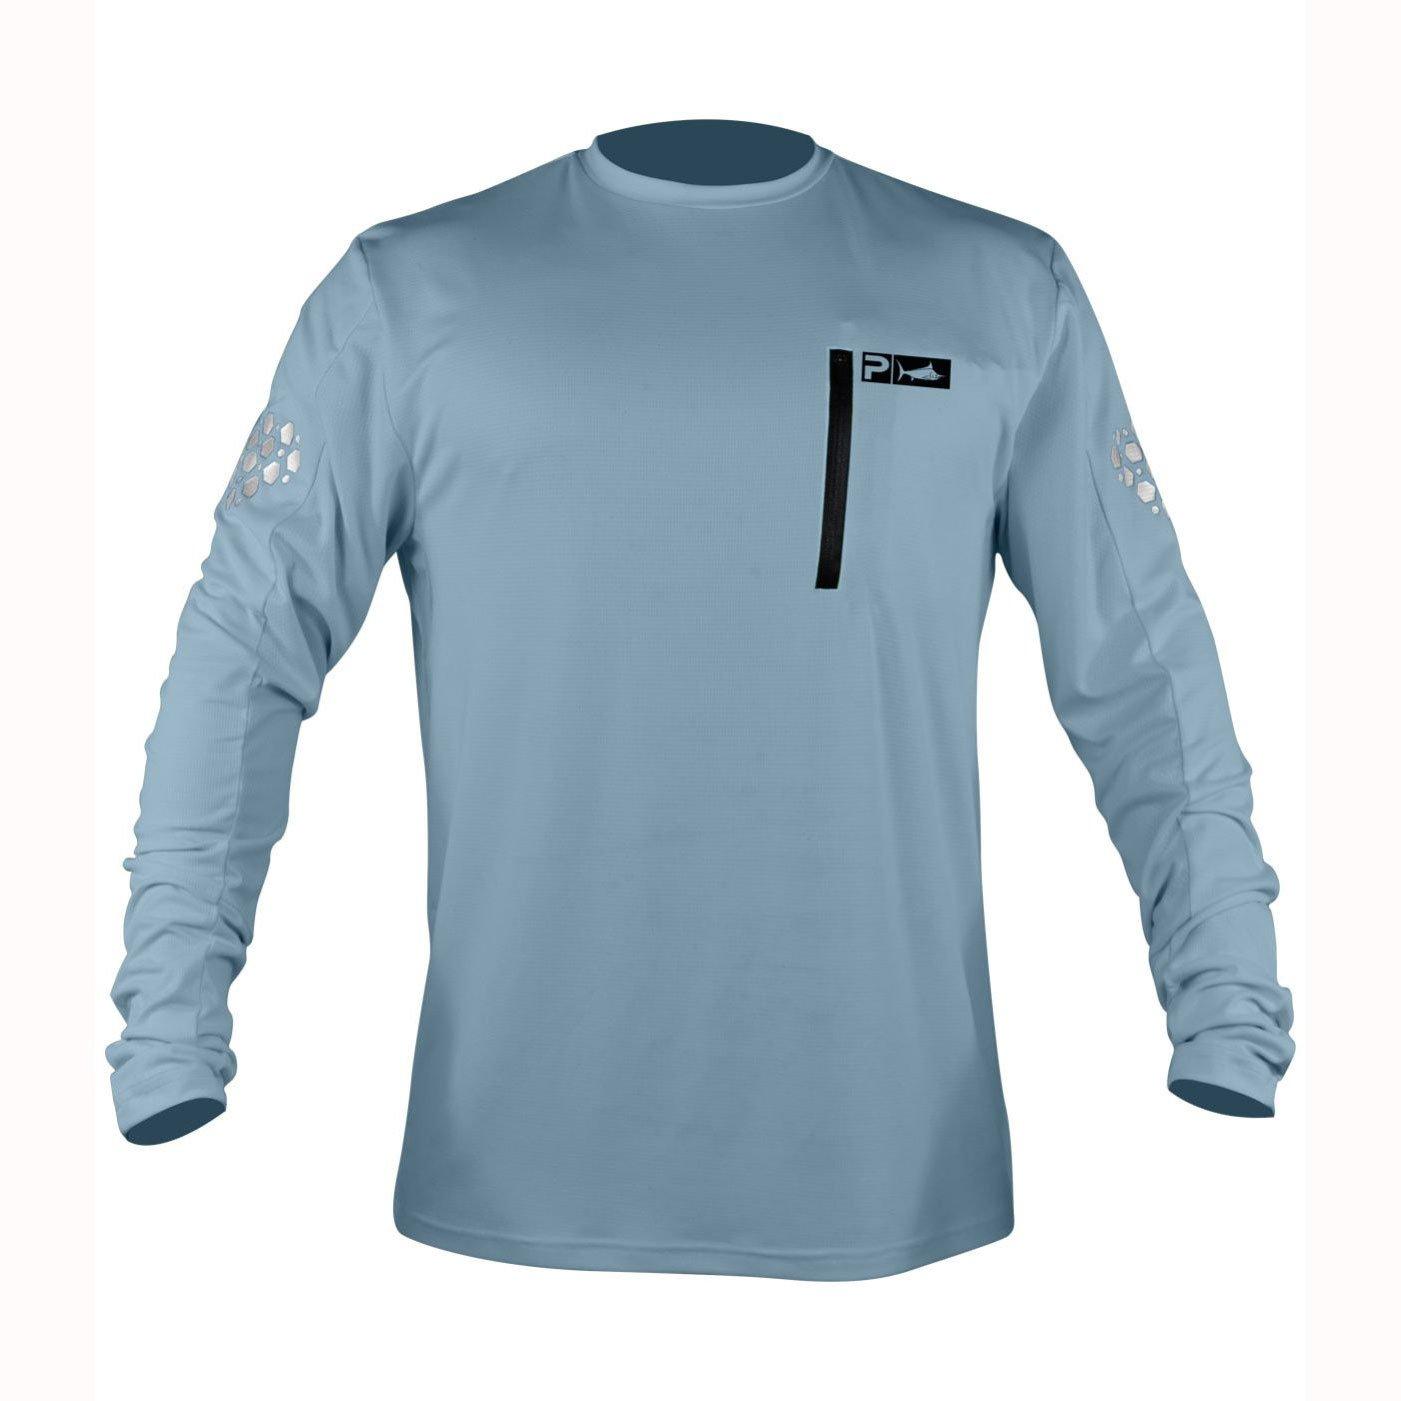 8dcbaa6be Pelagic Aeroflex de Hombres Manga Larga Camiseta de Pesca